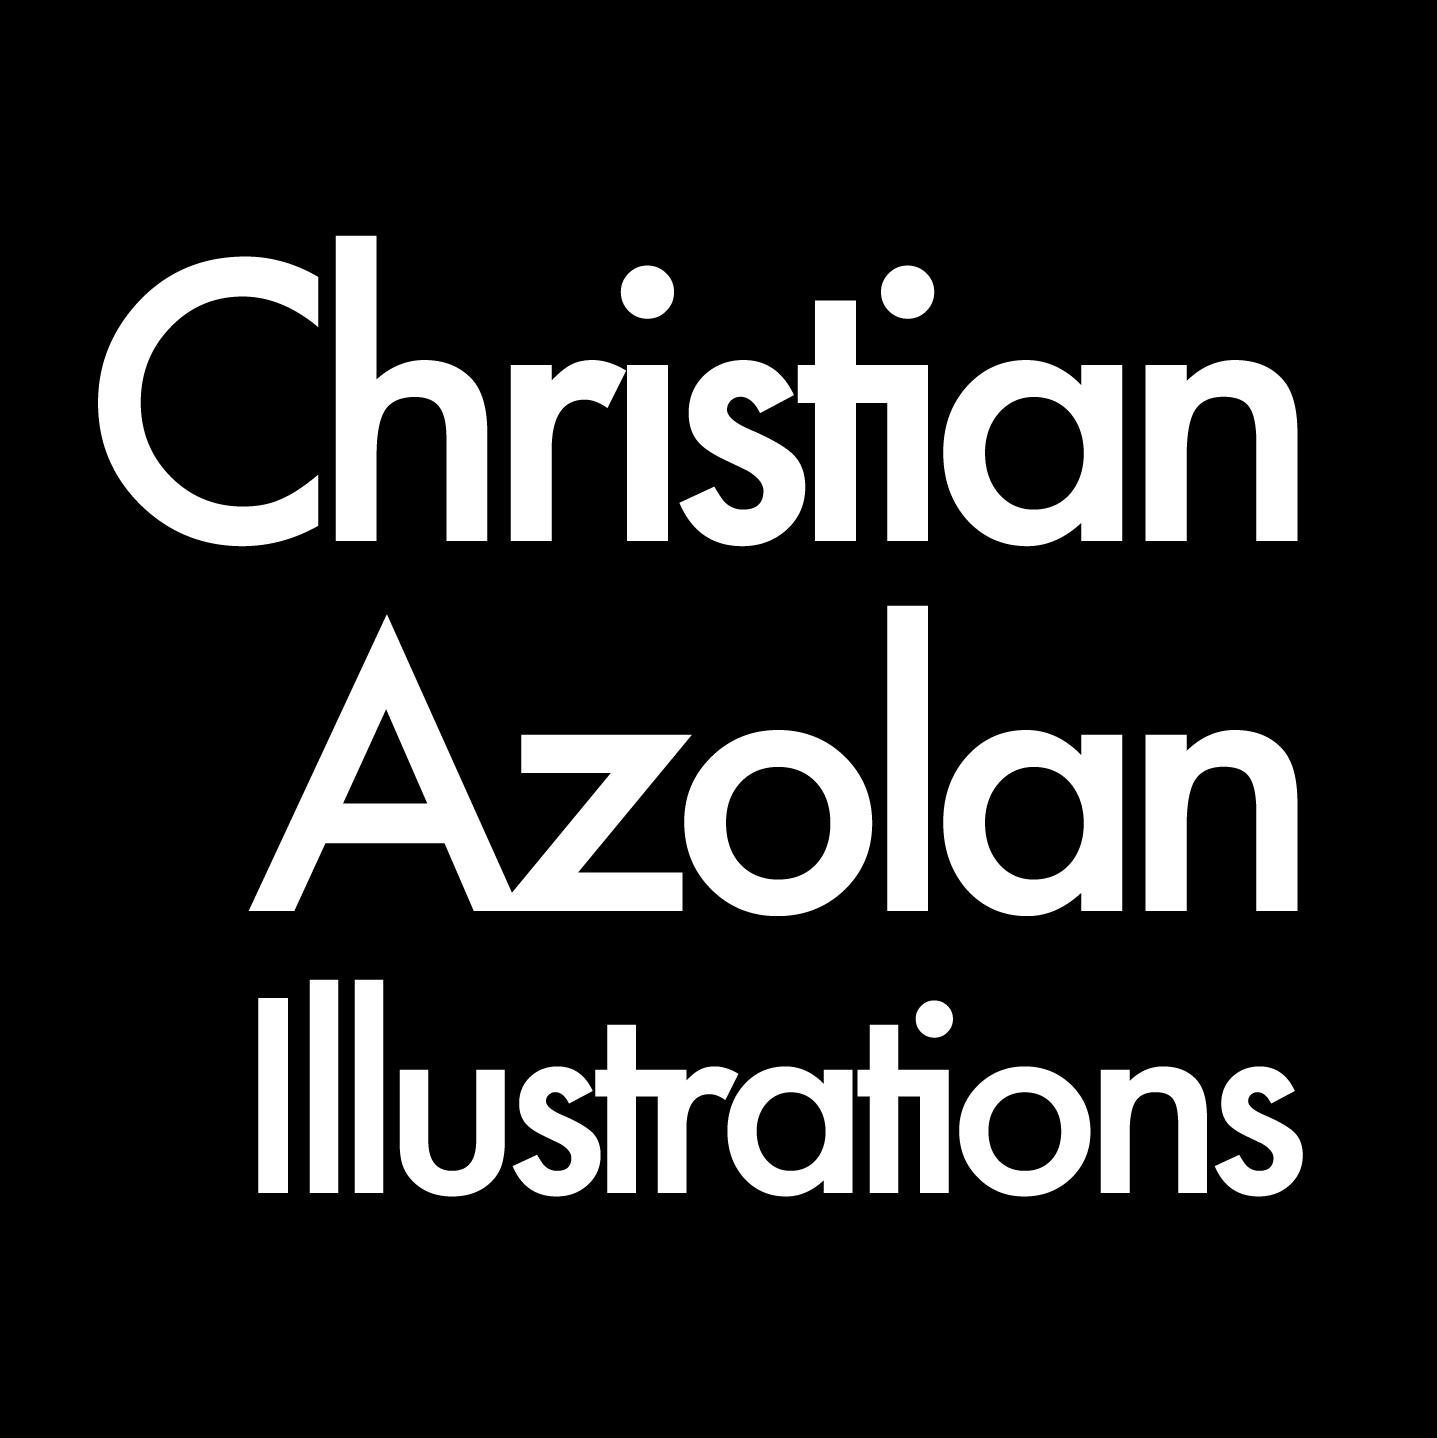 Christian Azolan Illustrations